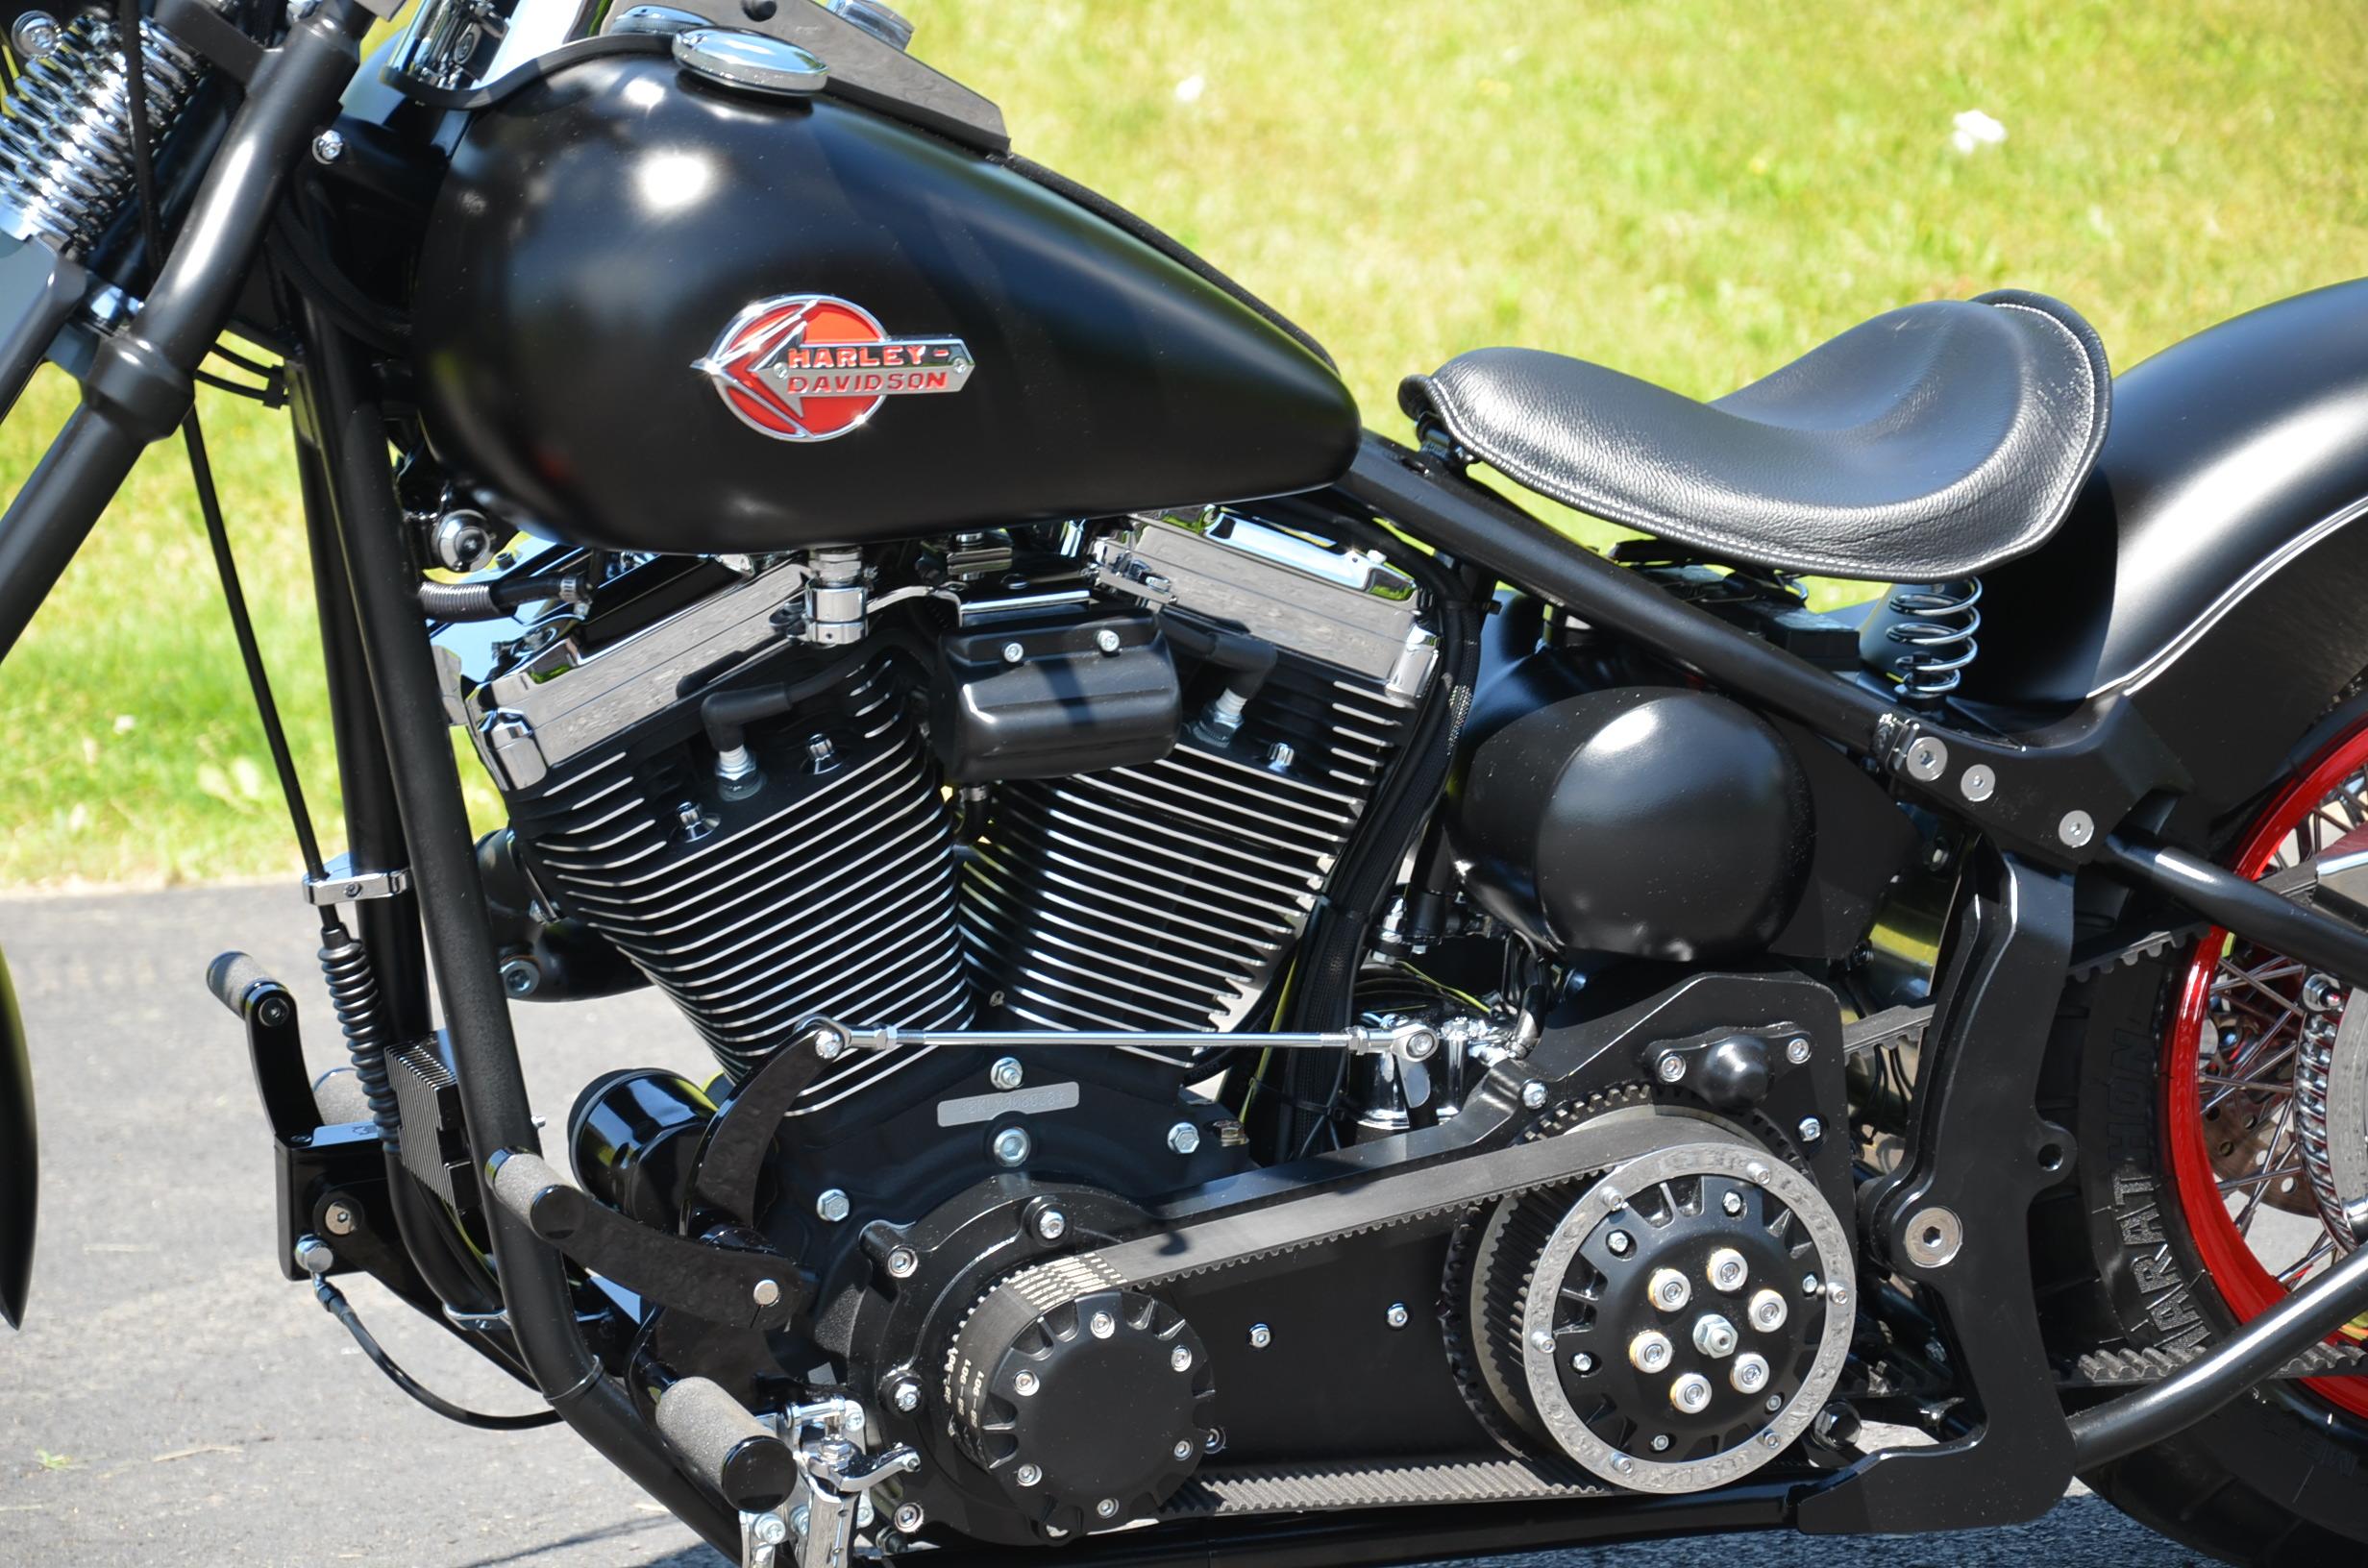 Harley-Davidson Evolution V-Twin Motorcycles - HISTORY OF ...